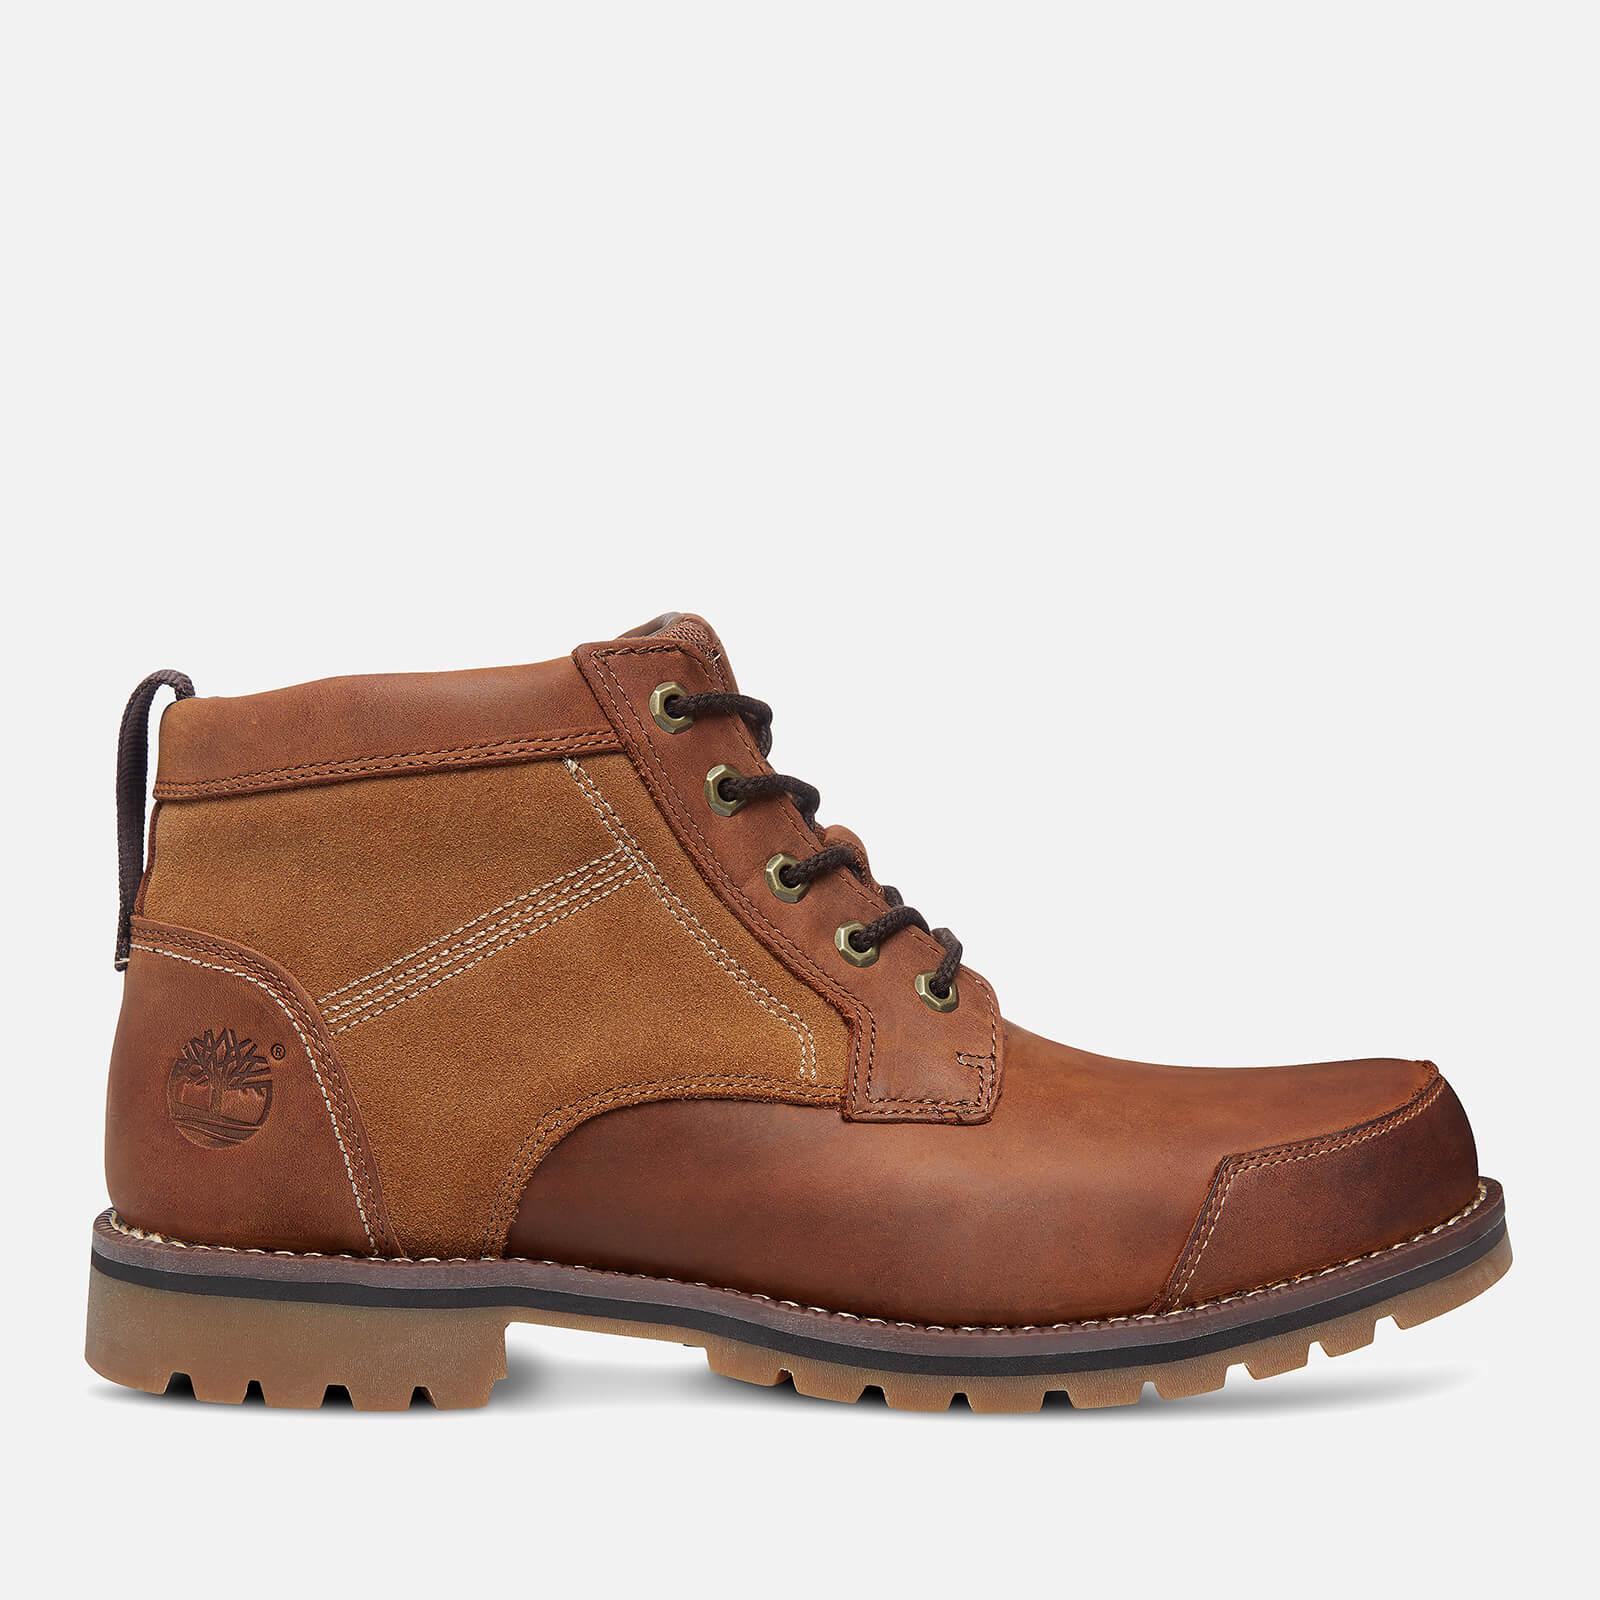 b675a5f960c Timberland Men's Larchmont Nubuck Chukka Boots - Medium Brown